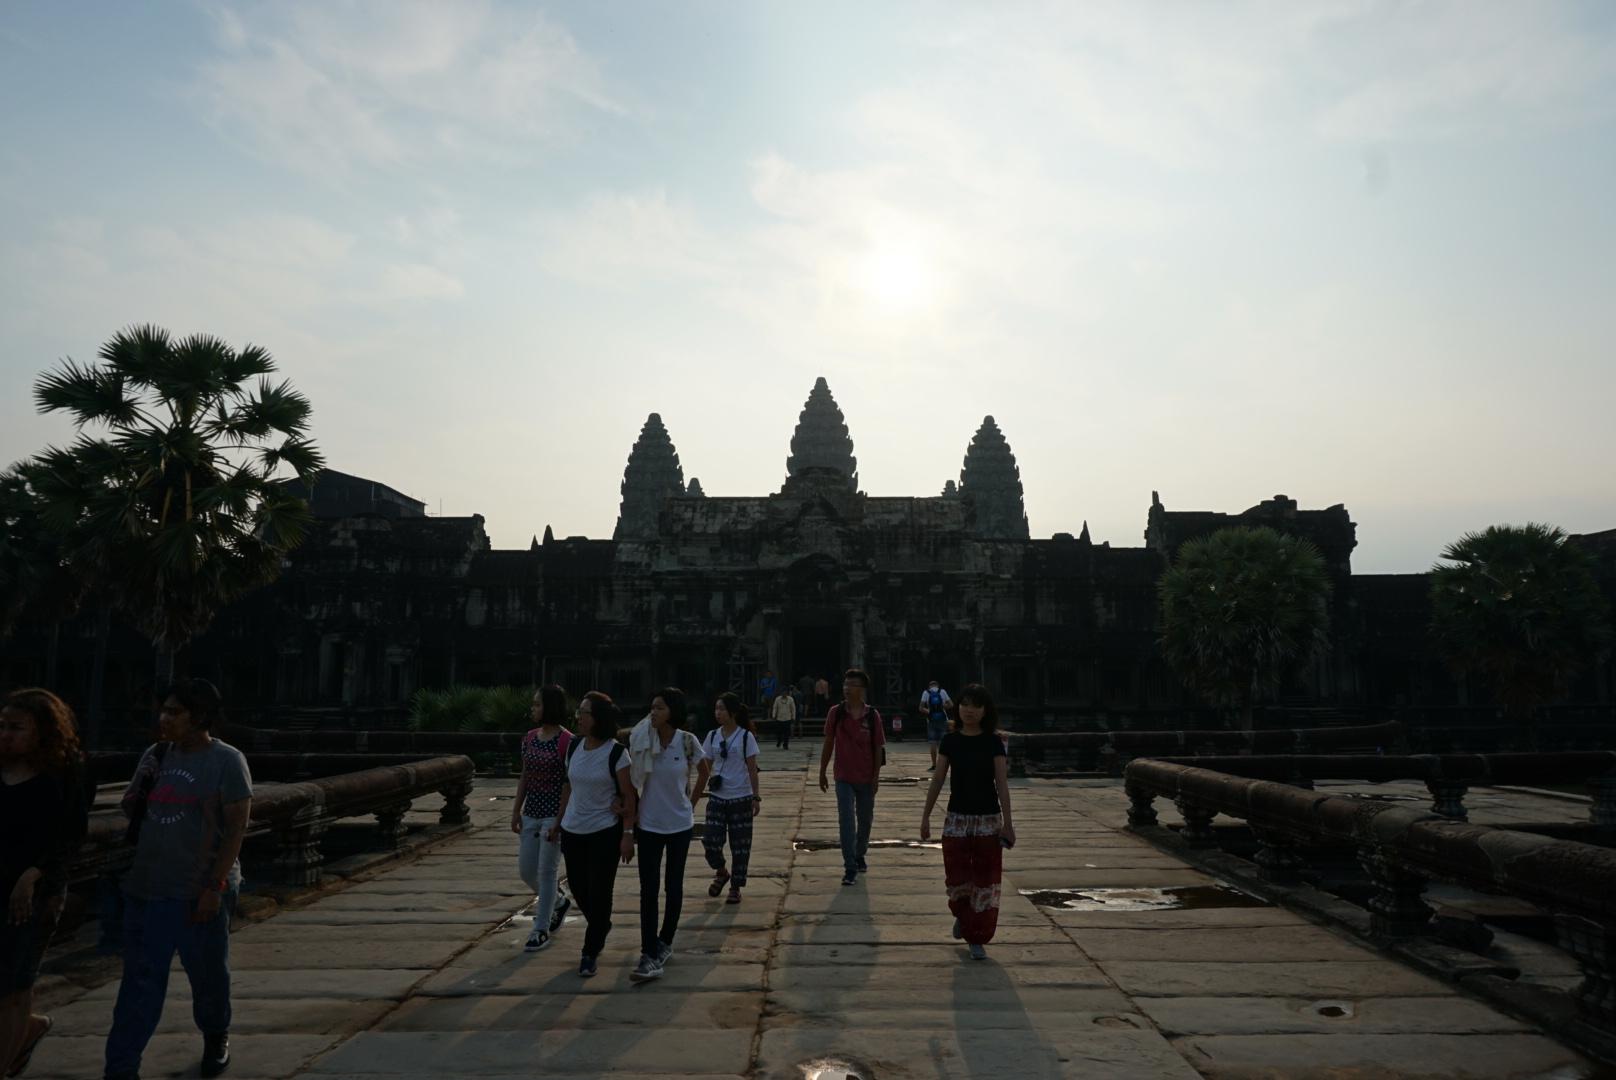 Walking up to Angkor Wat